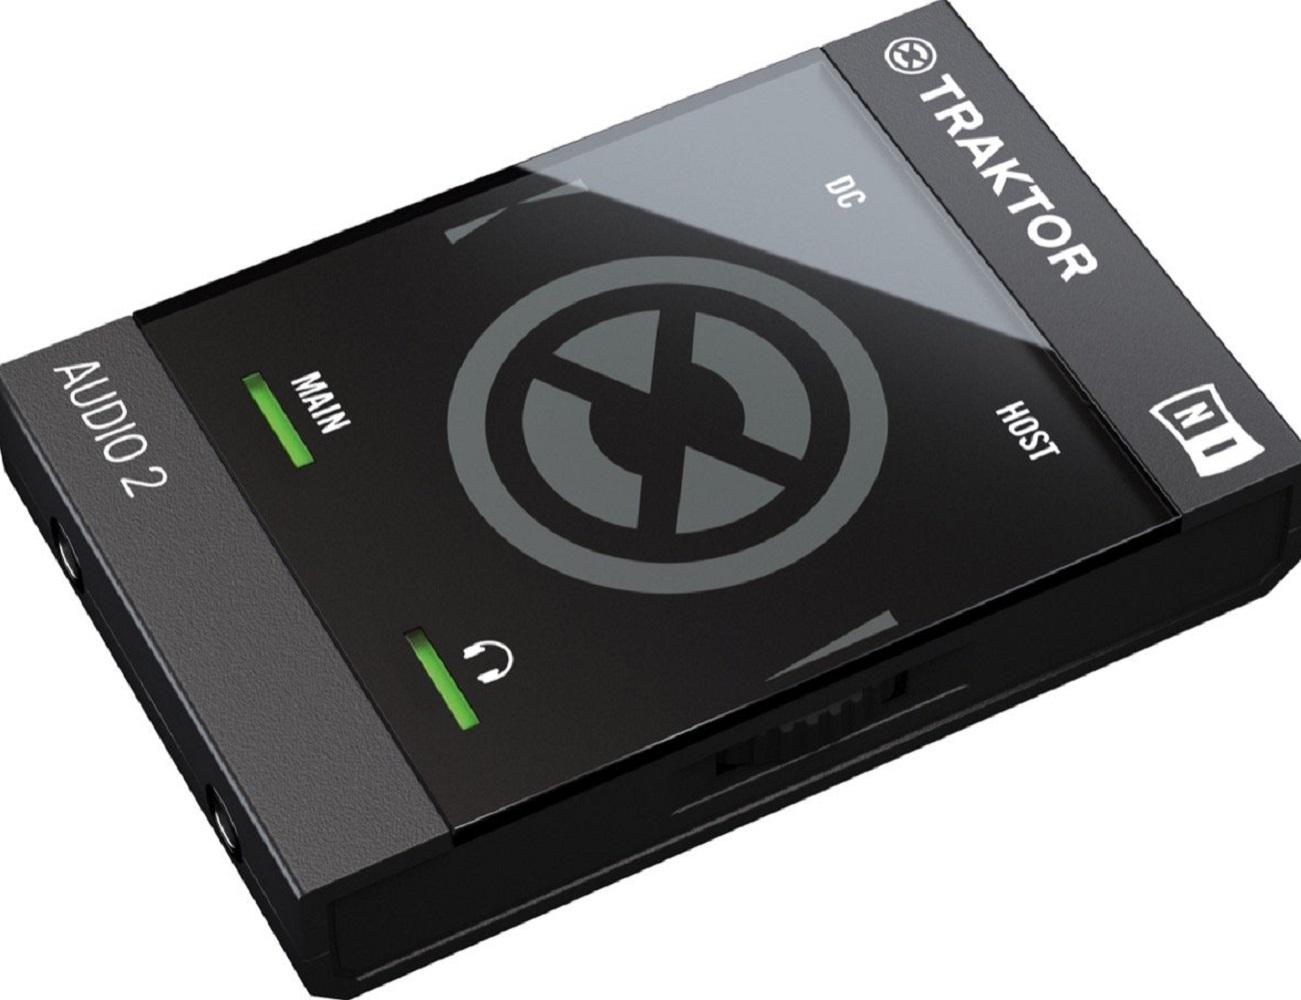 Traktor Audio 2 DJ Audio Interface